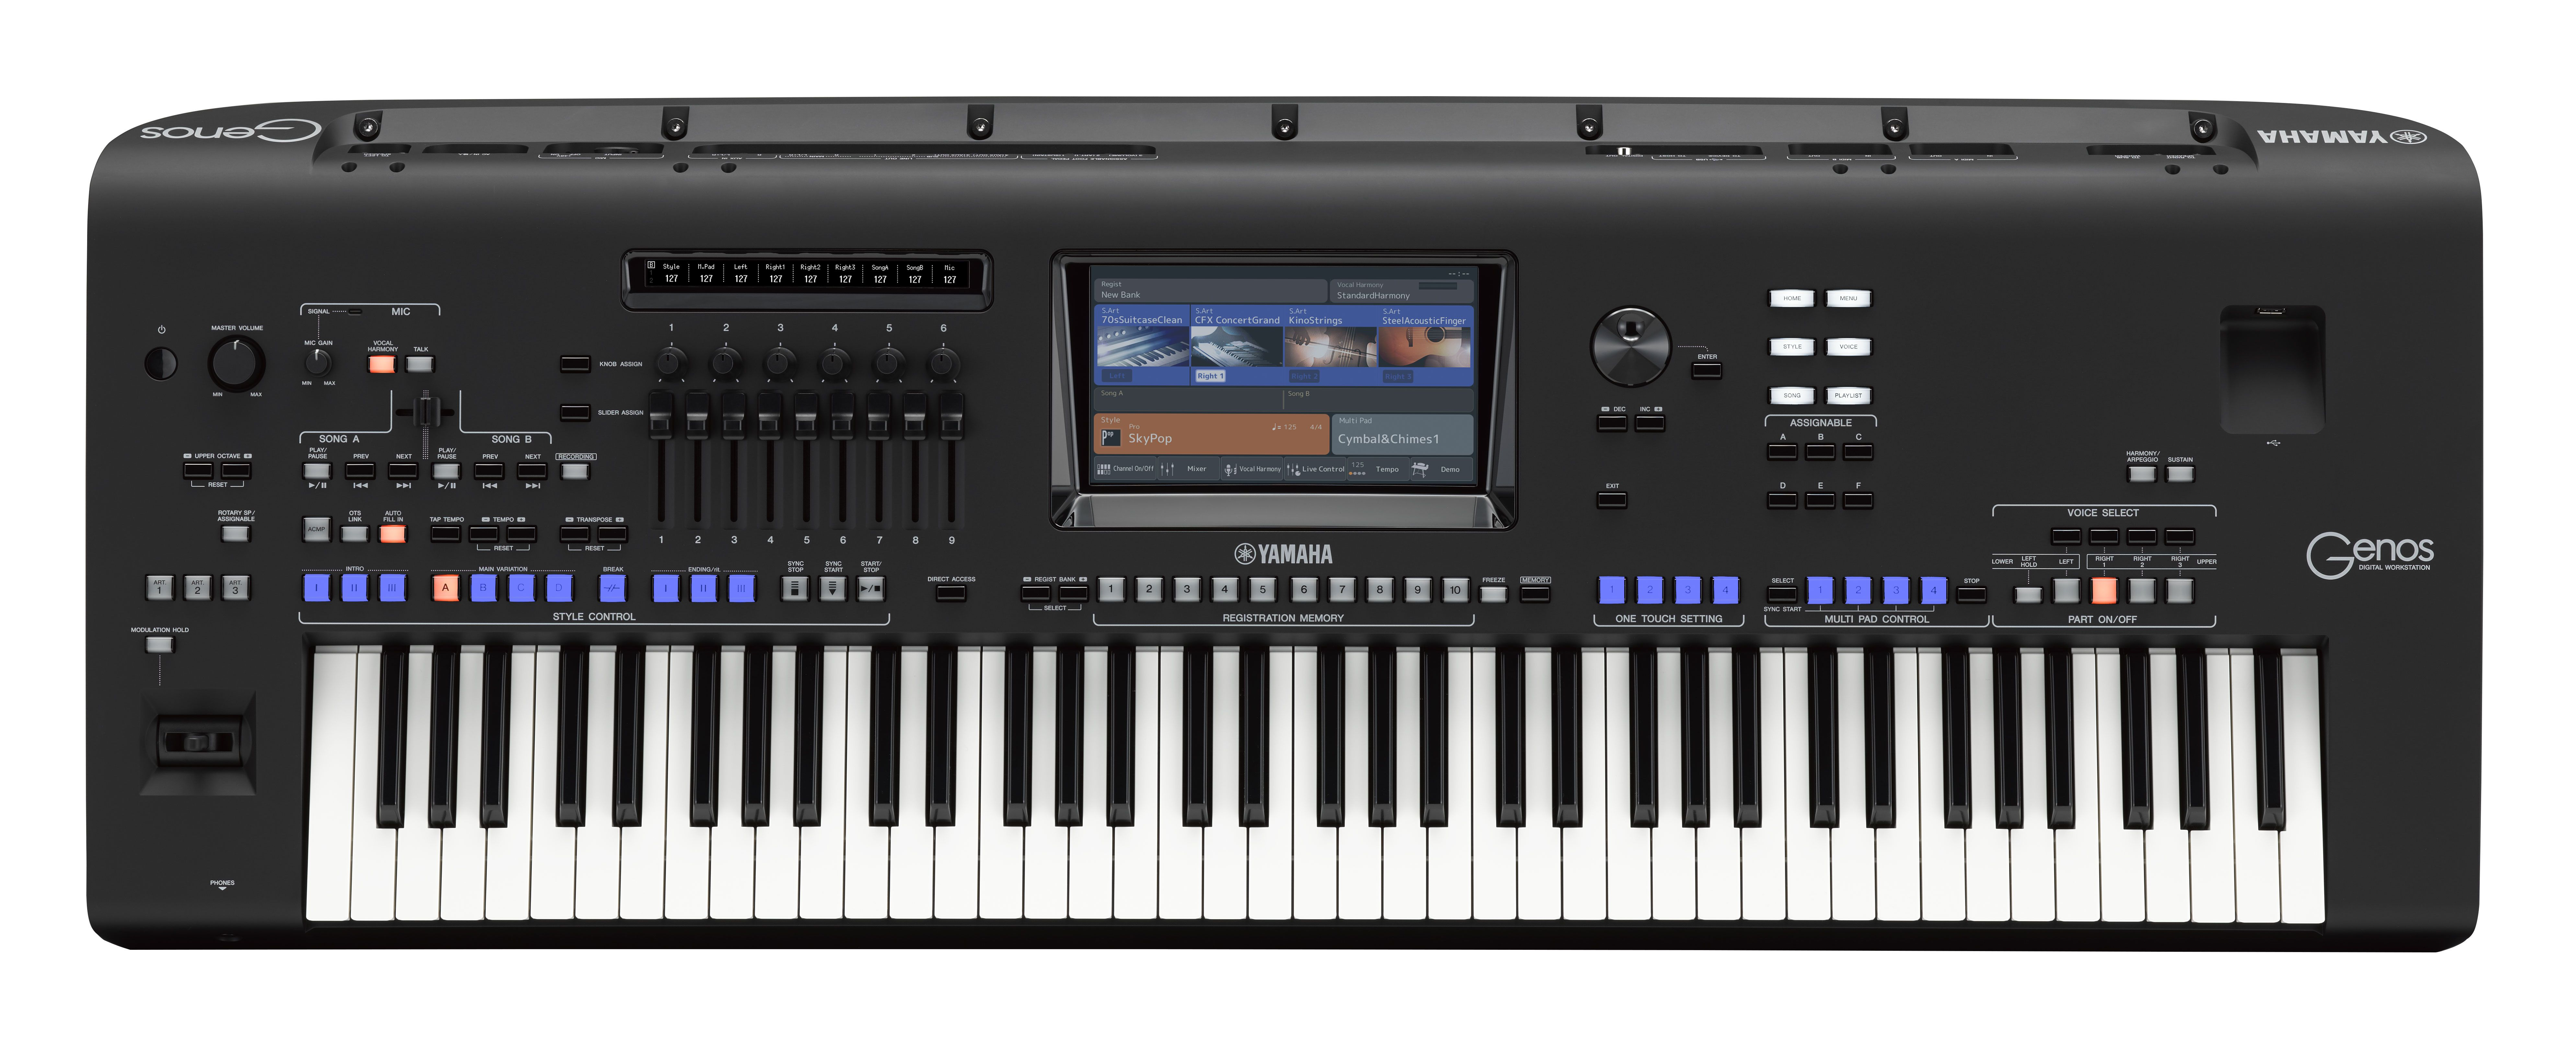 musical keyboards buy yamaha keyboards casio keyboards roland keyboards korg. Black Bedroom Furniture Sets. Home Design Ideas